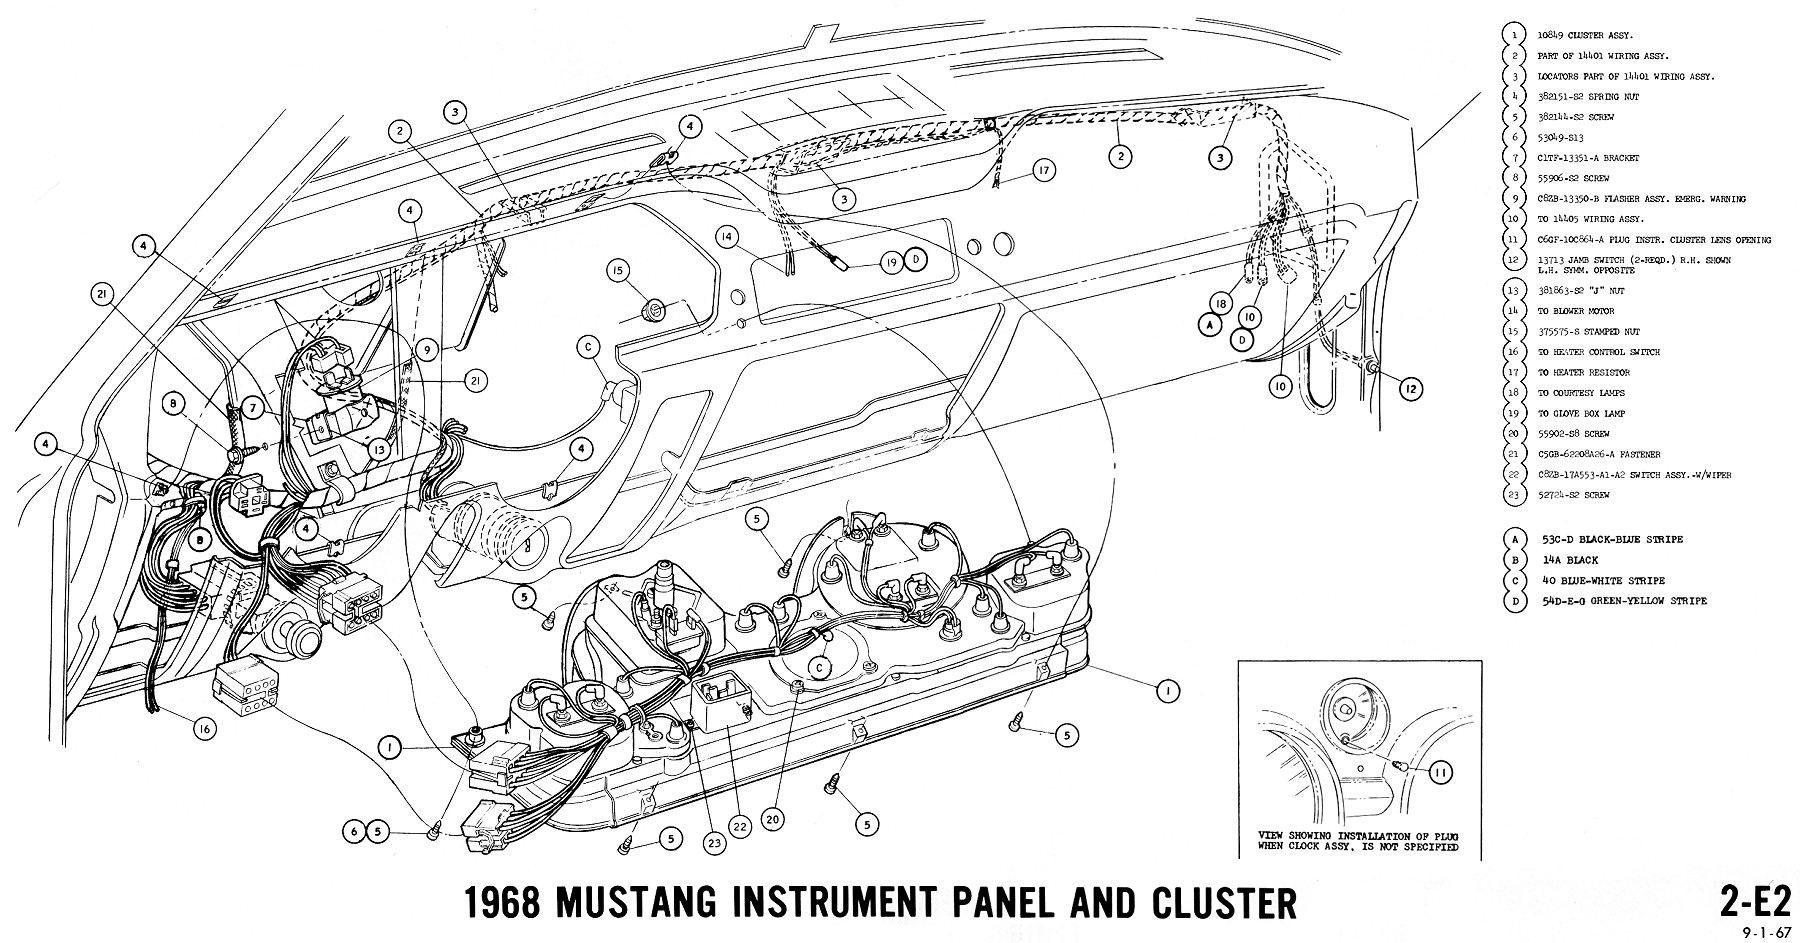 66 Mustang Fuel Gauge Wiring Diagram Electrical Schematics Diy Basics Cluster Enthusiasts Diagrams U2022 1966 Vacuum